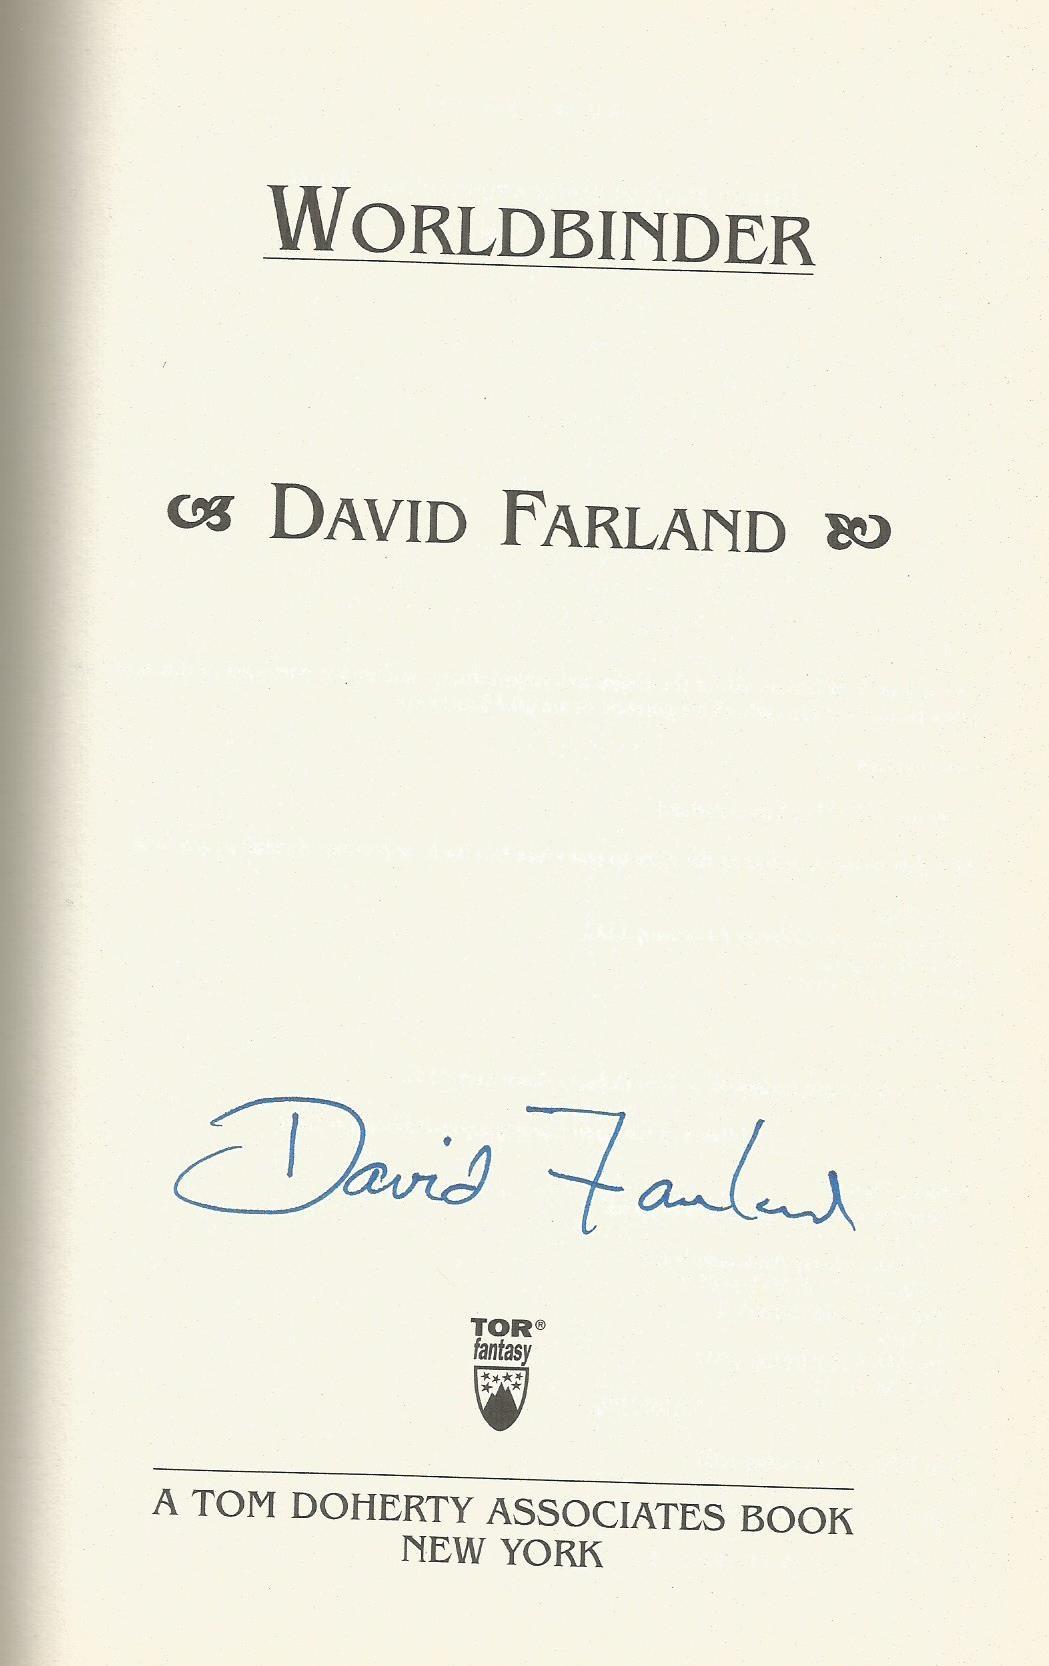 David Farland